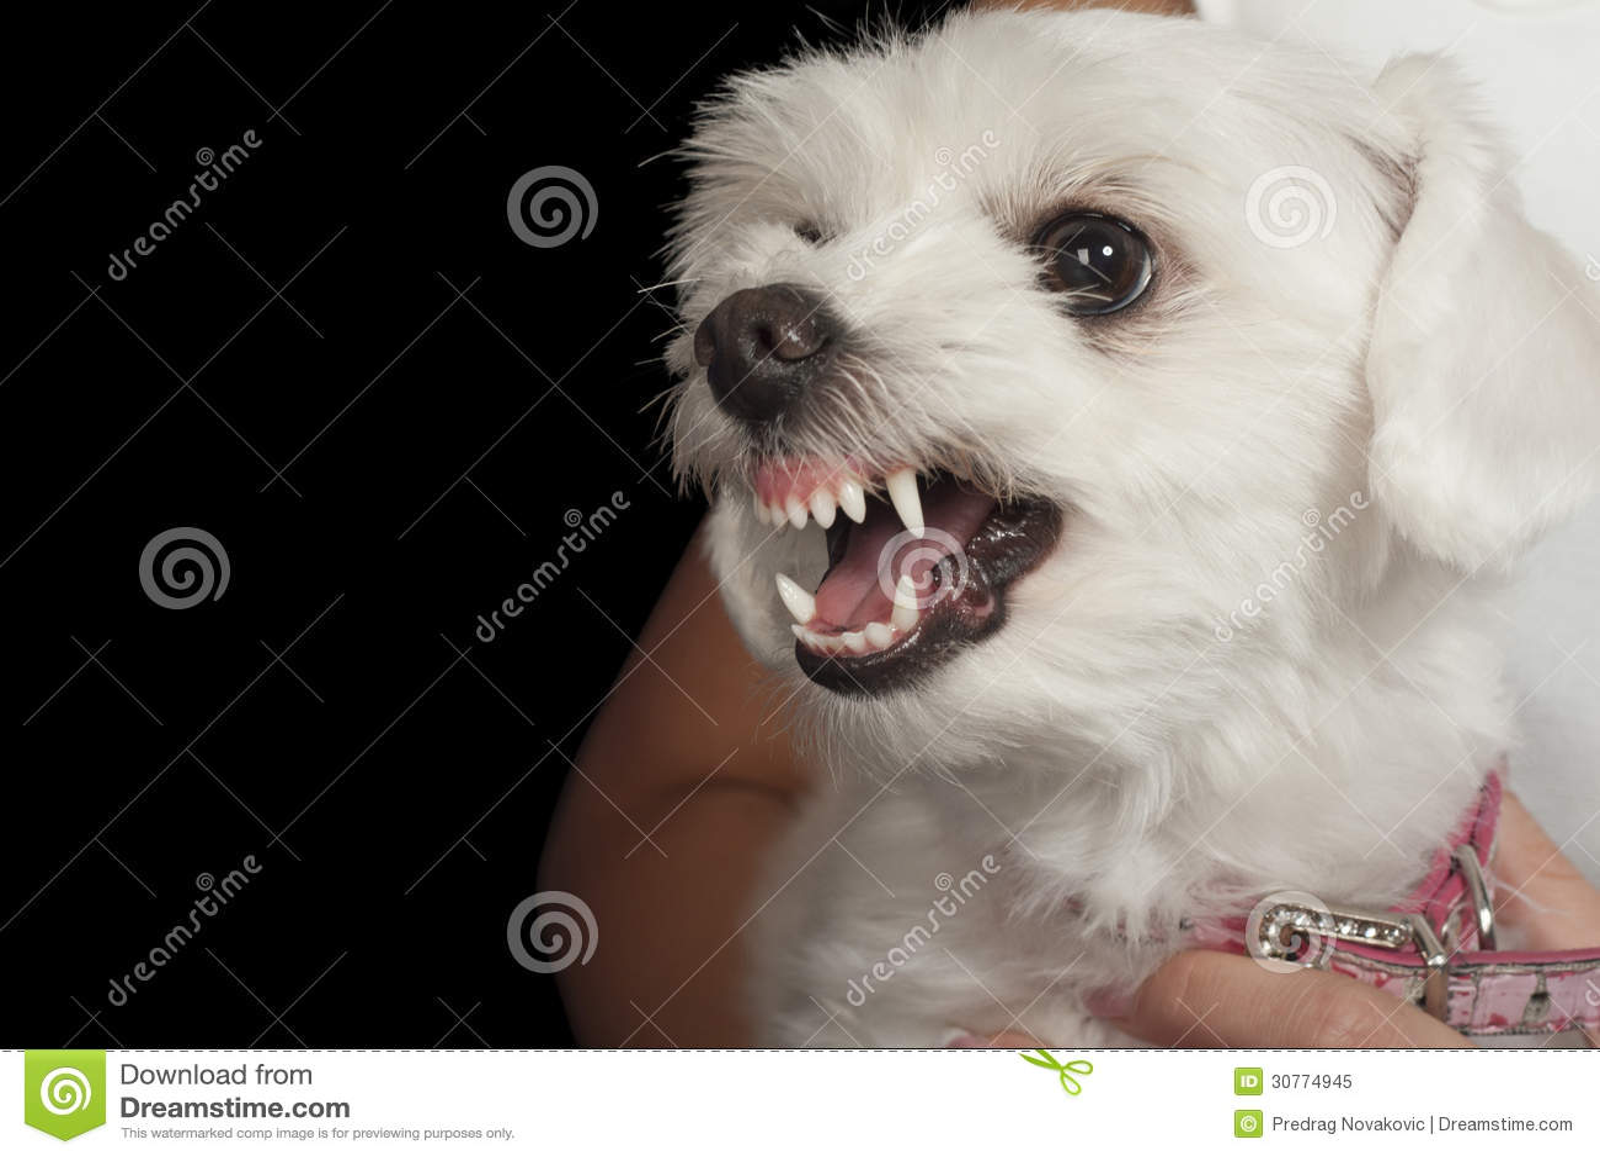 Maltese Puppy Royalty Free Stock Photo - Image: 30774945